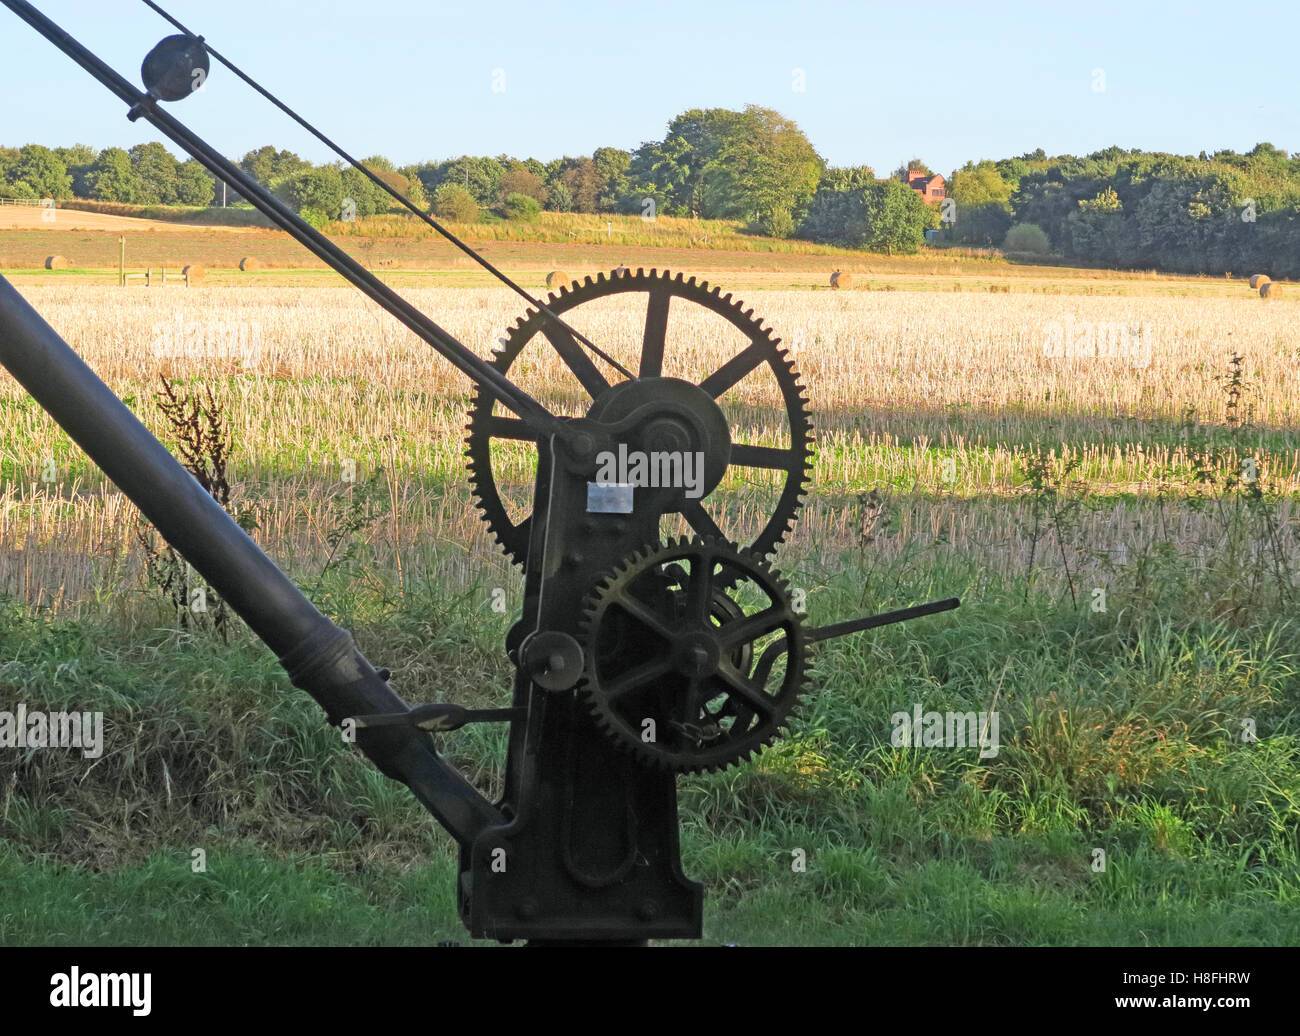 Laden Sie dieses Alamy Stockfoto Bridgewater Canal Maschine Hebekran, Moore, Warrington, Cheshire, England, UK - H8FHRW